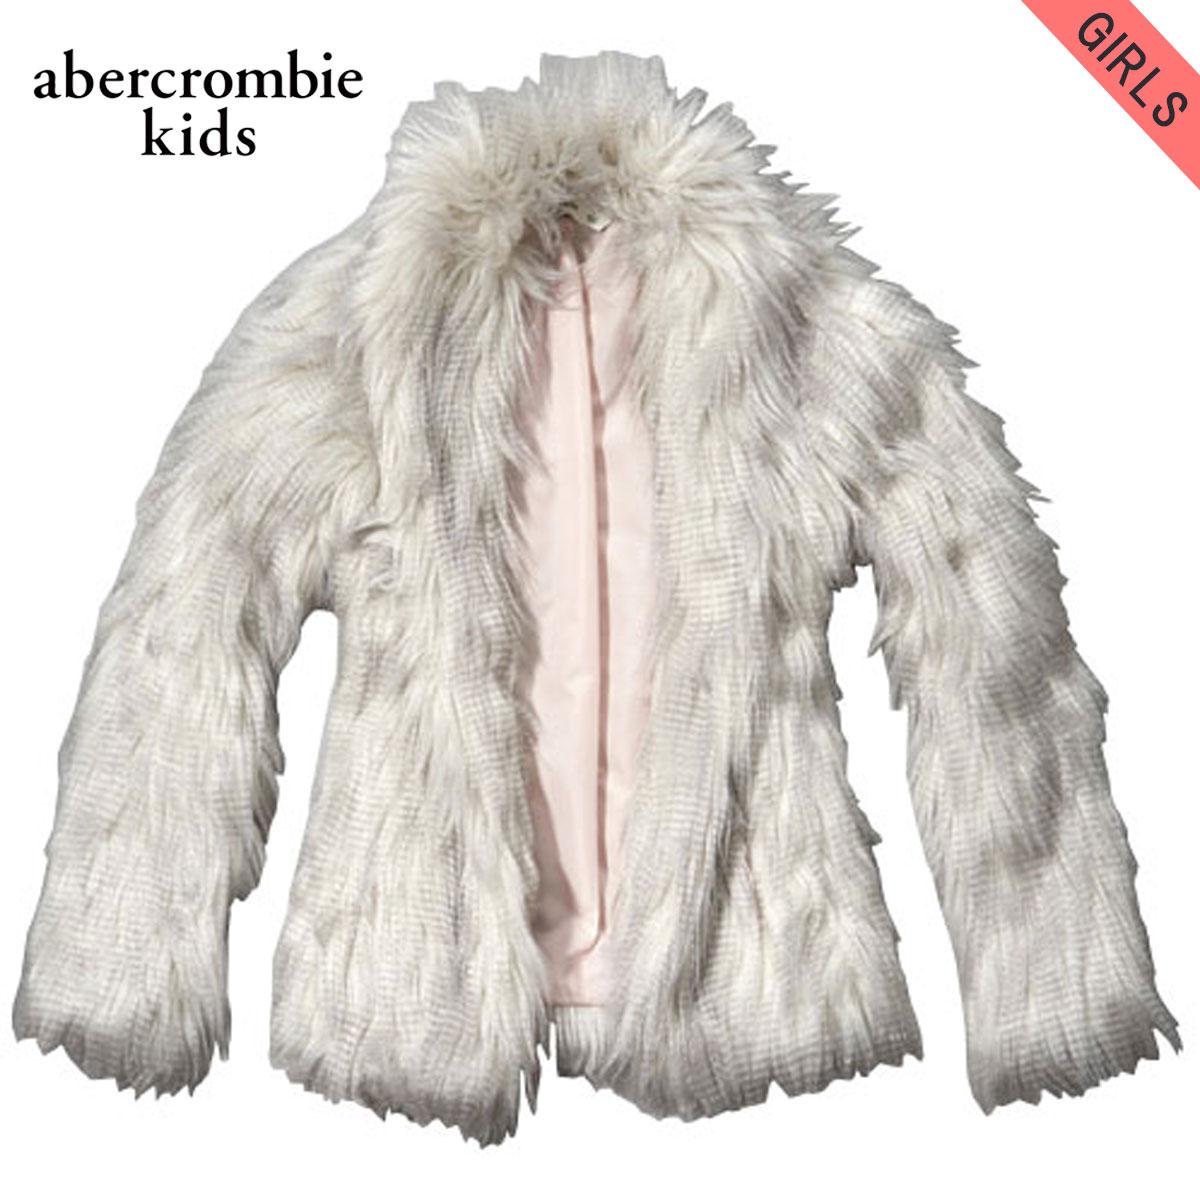 4cb94f186 ABBA black kids AbercrombieKids regular article children's clothes girls  outer jacket fluffy faux fur jacket 244 ...